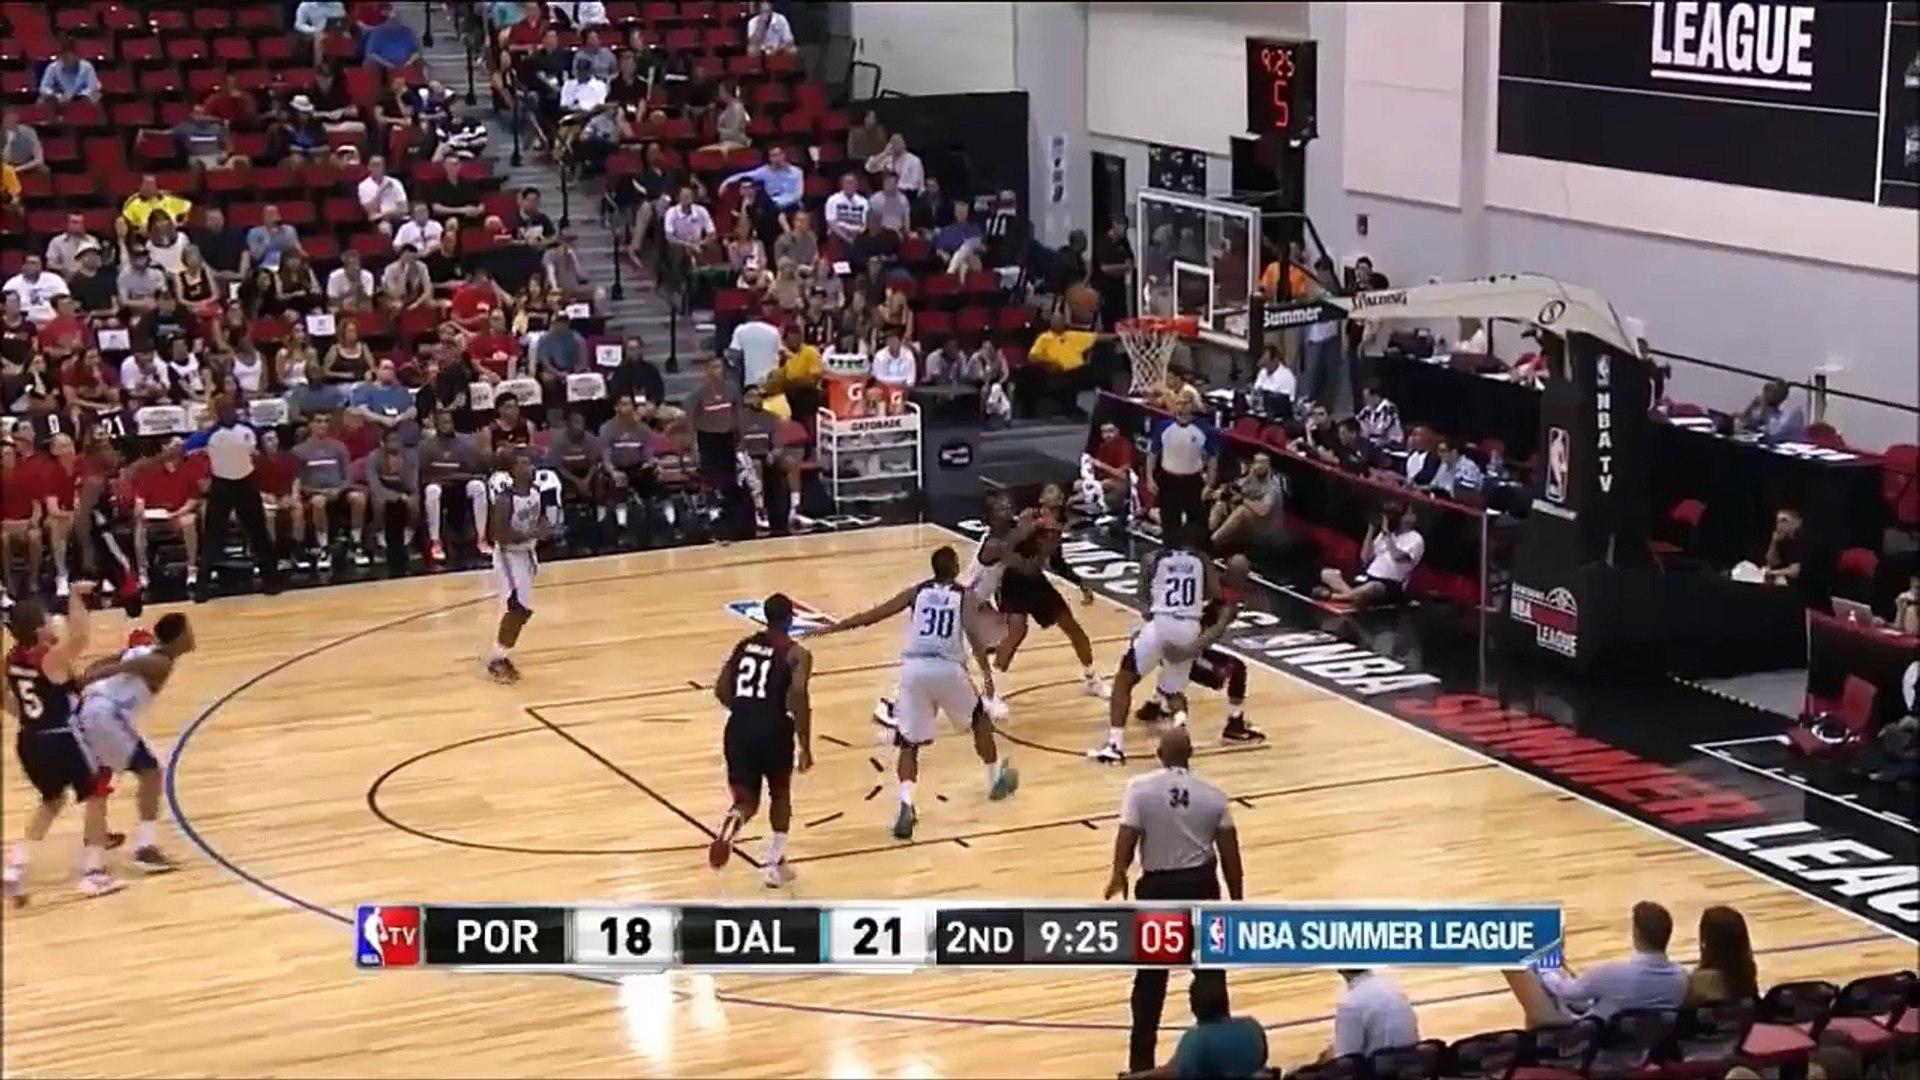 Bobby Ray Parks Jr. free throw Dallas Maverick vs. Portland TrailBlazers - 2015 NBA Summer League